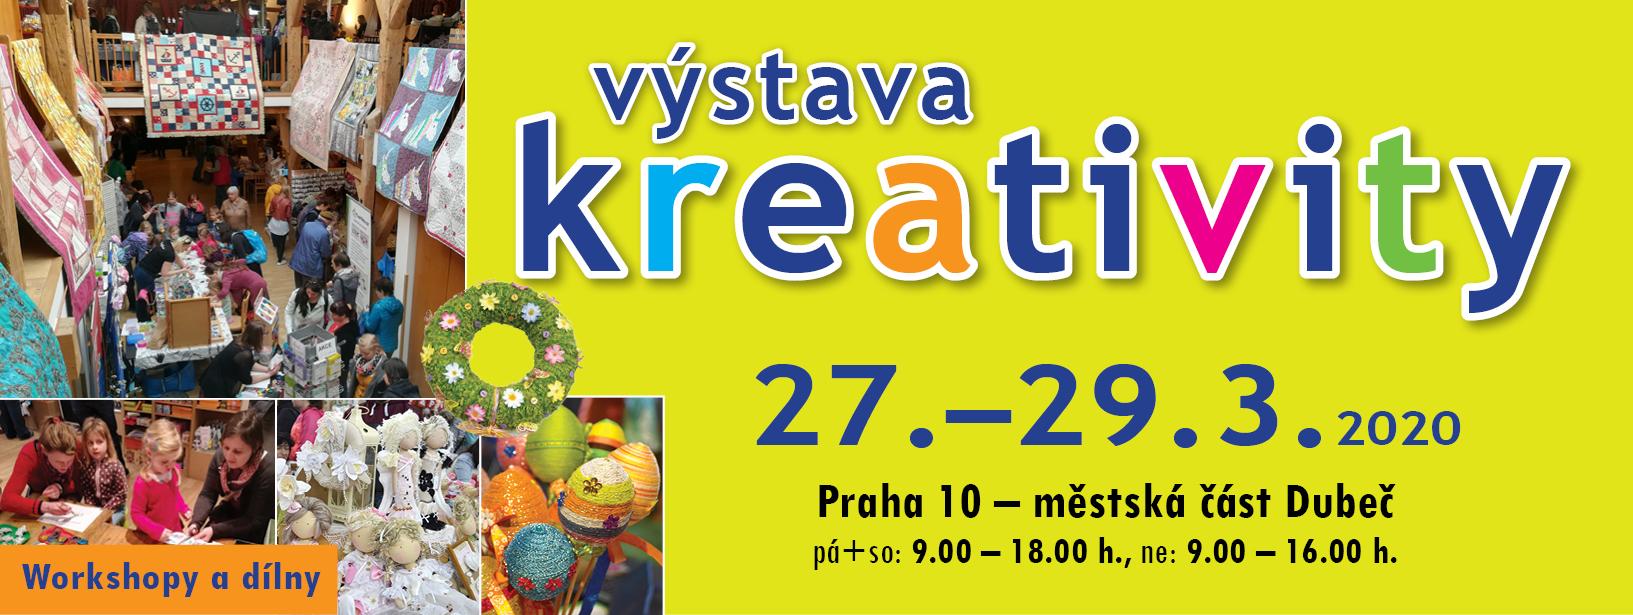 Výstava Kreativity – jaro 2020